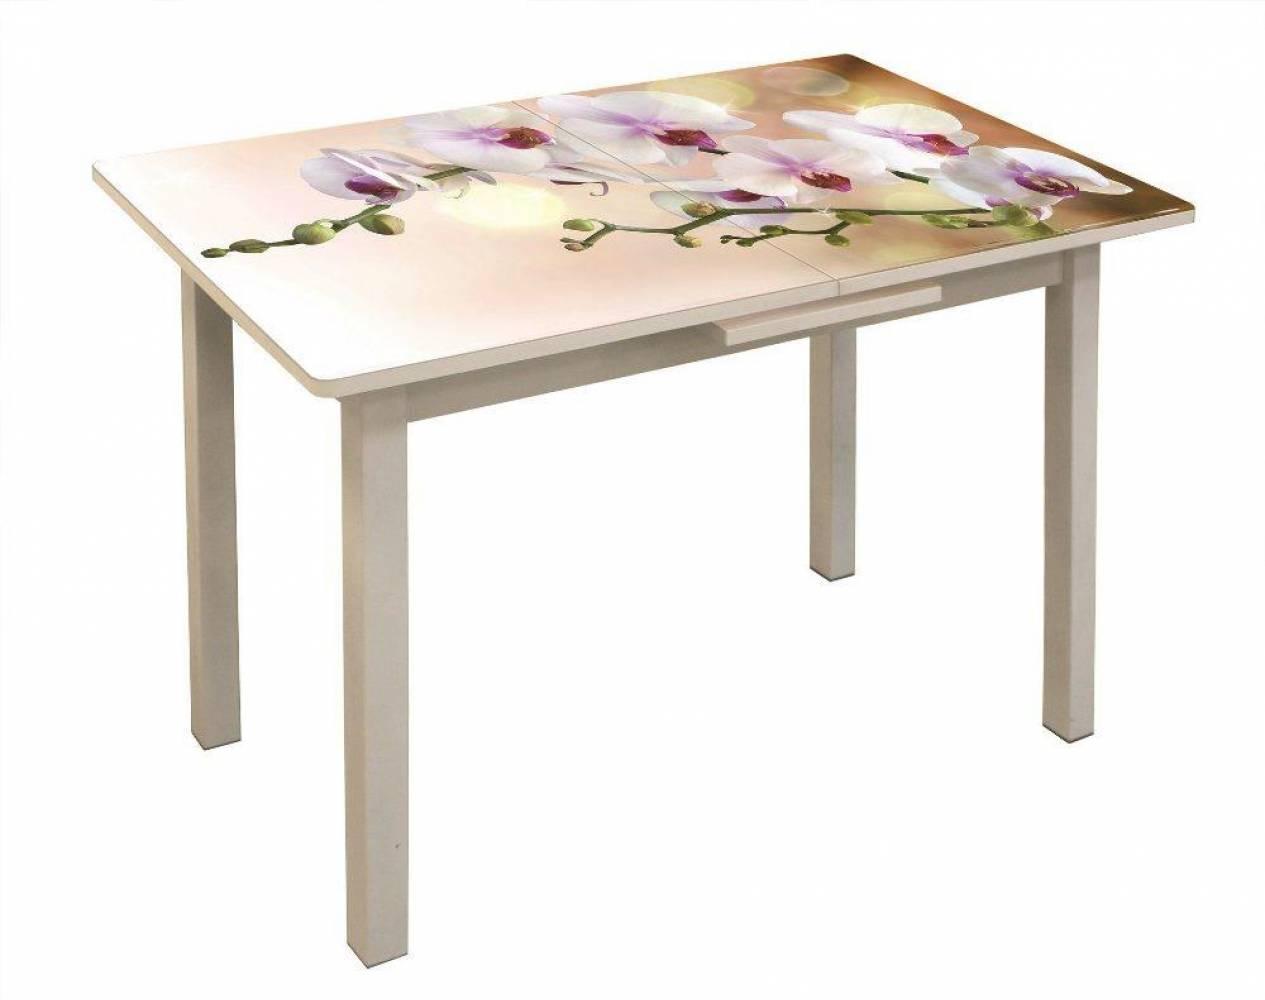 Стол обеденный раздвижной Баунти 2 Орхидея 3 белый/белый муар/50х50